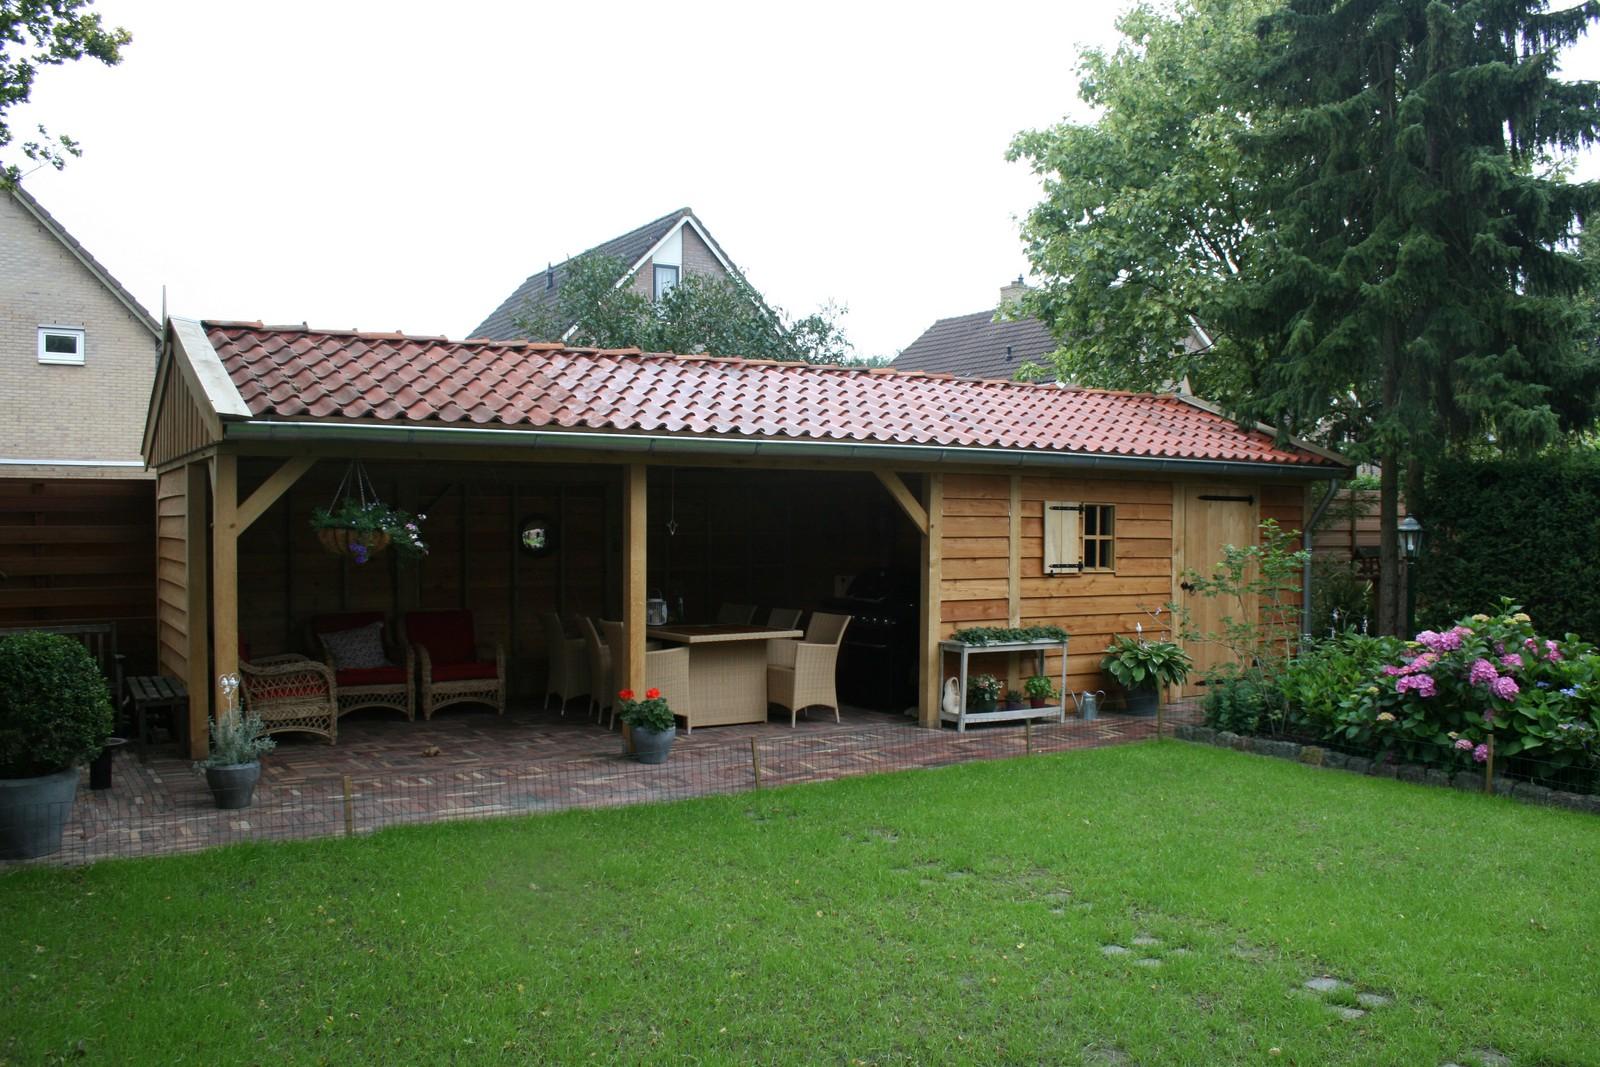 Houten-tuinhuis-met-veranda-1 - tuinhuis met veranda